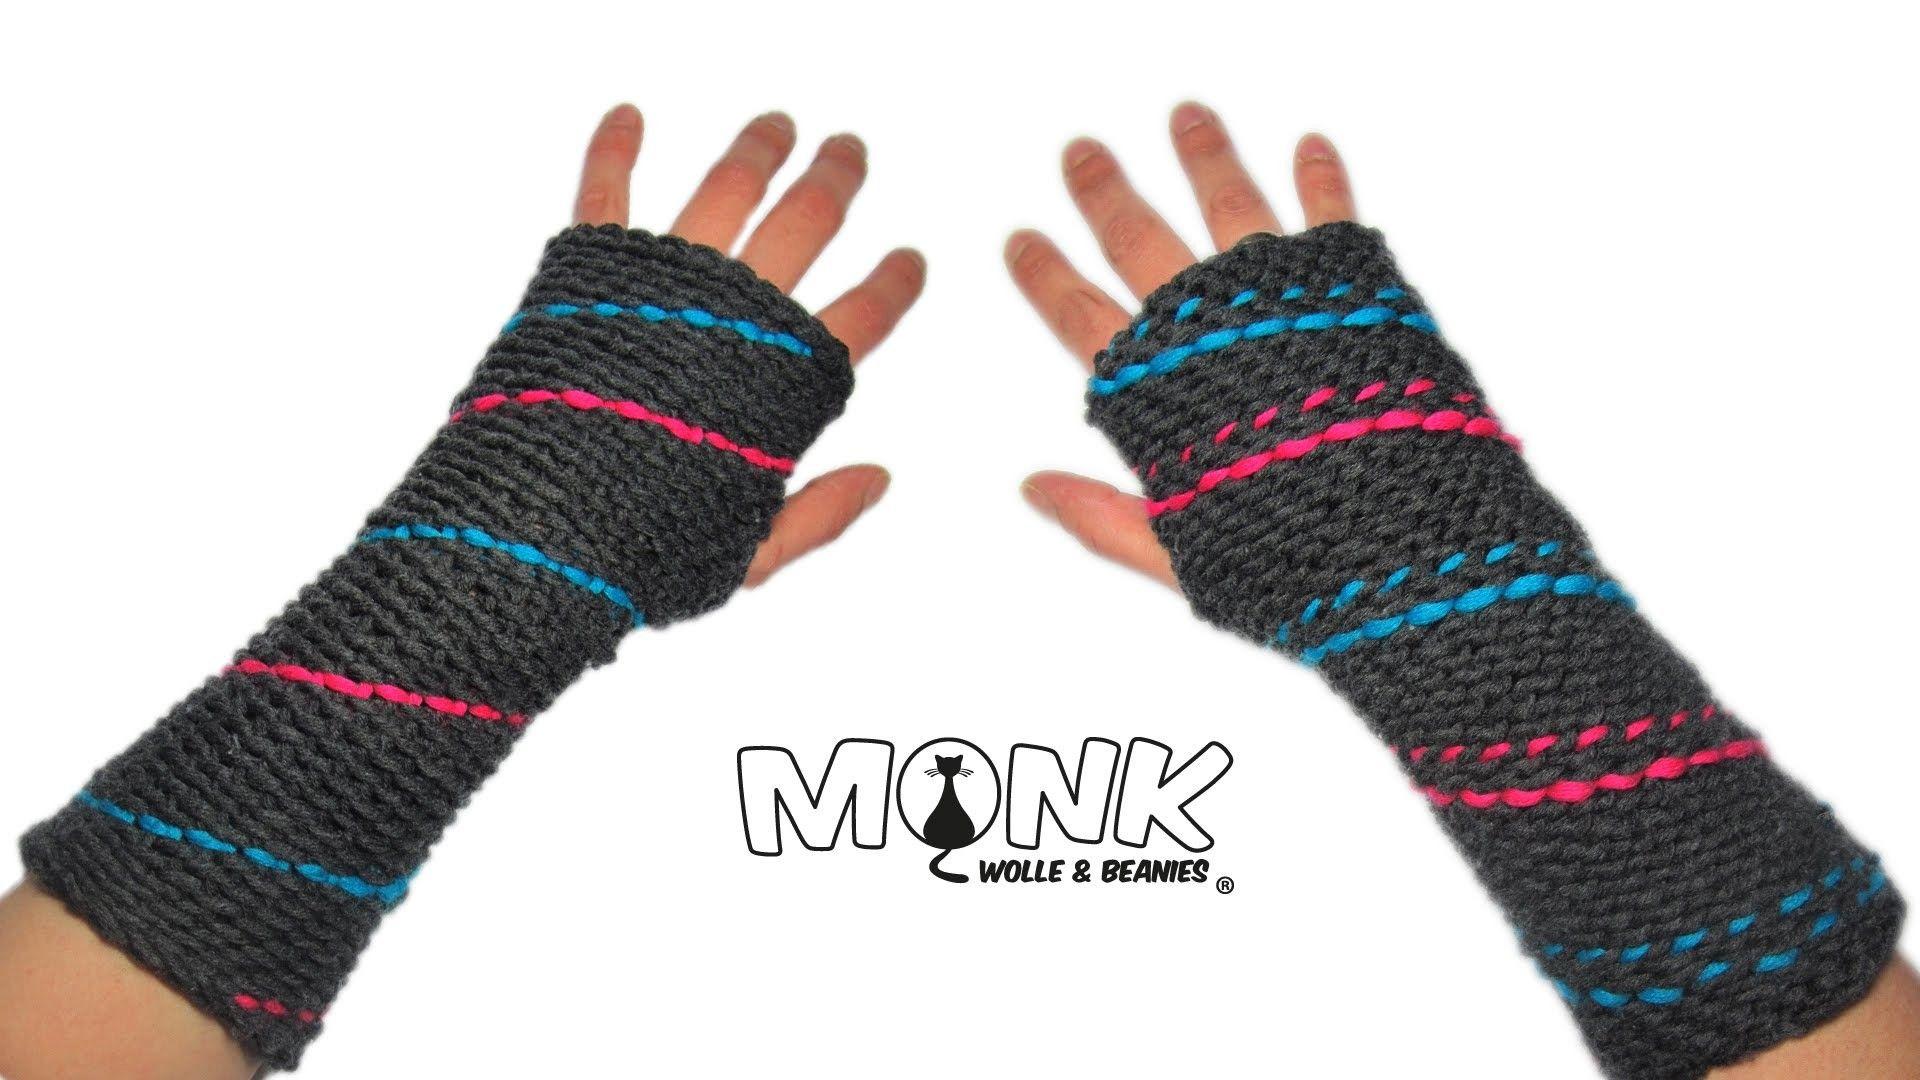 Funky Spitze Fingerlose Handschuhe Häkelmuster Collection - Decke ...